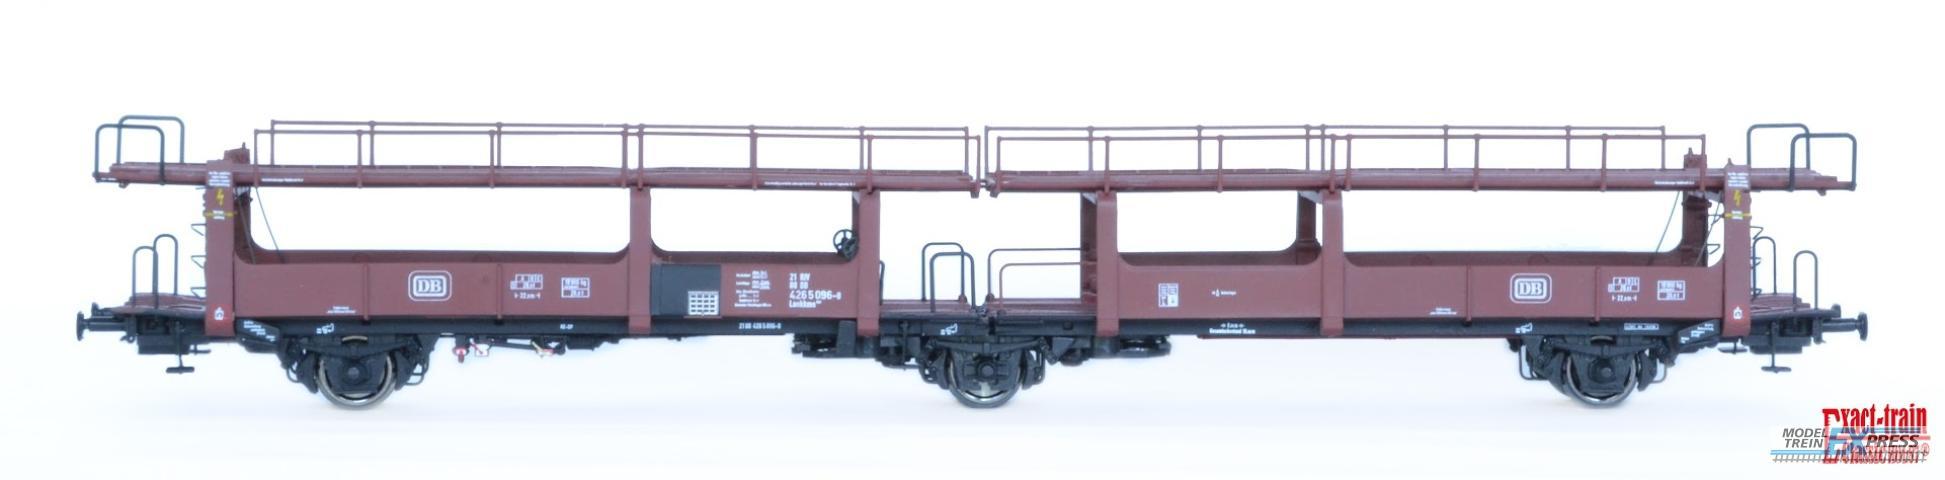 Exact-train 20003